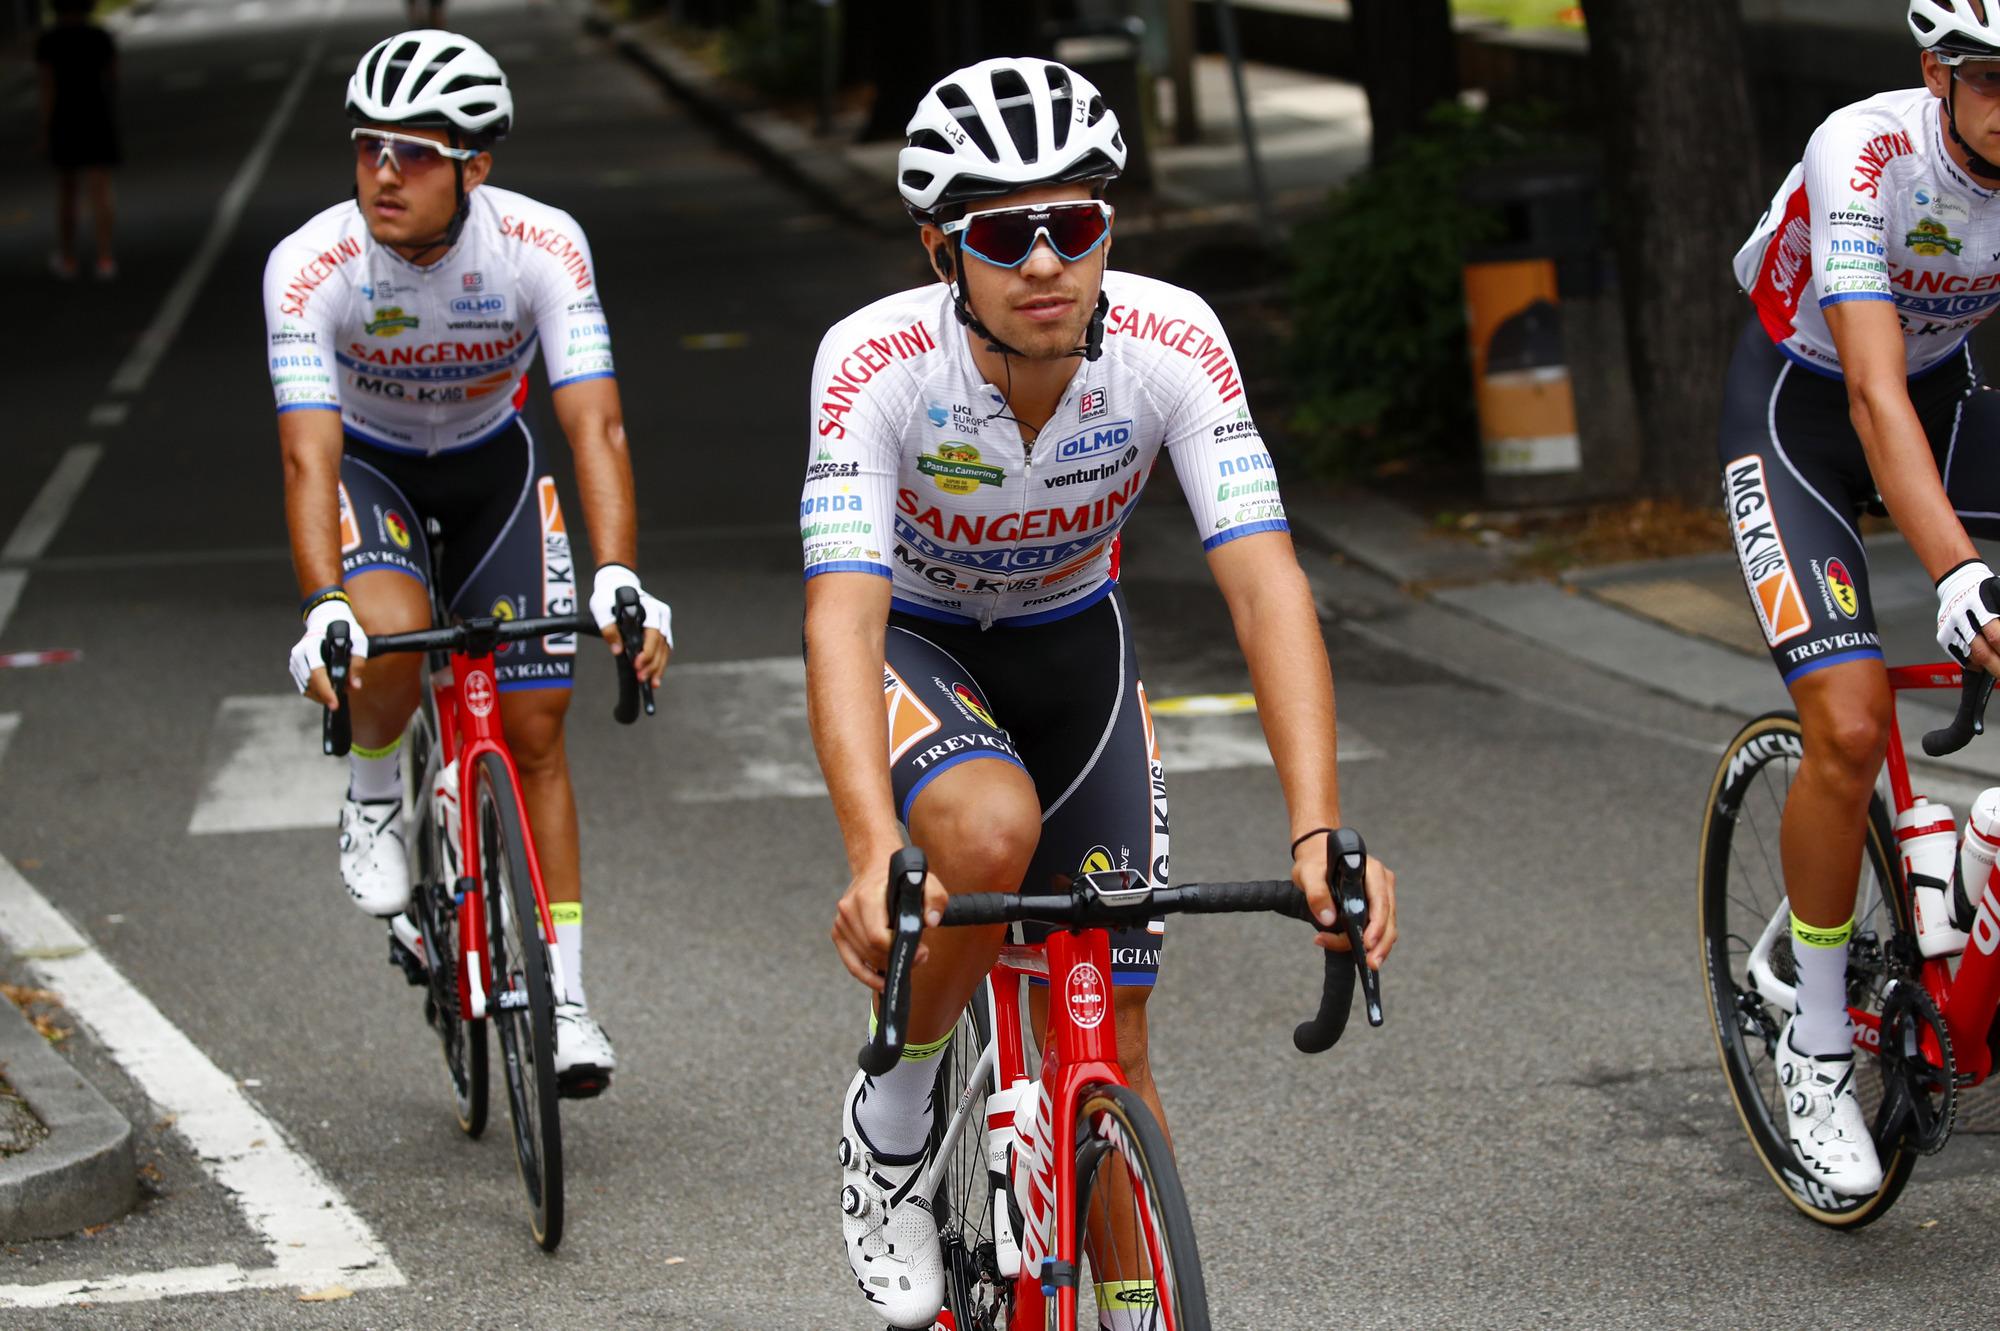 www.italciclismo.it